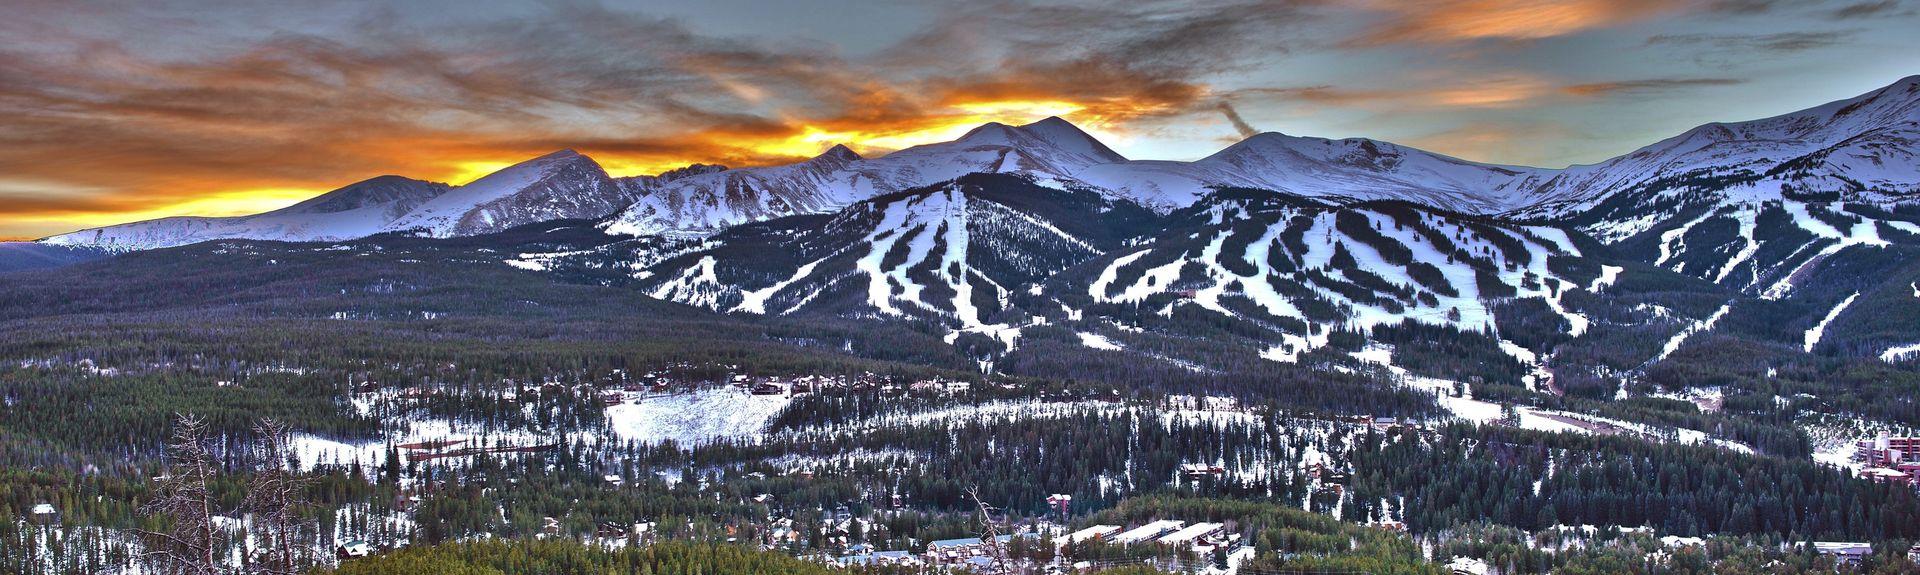 Montezuma, Colorado, United States of America